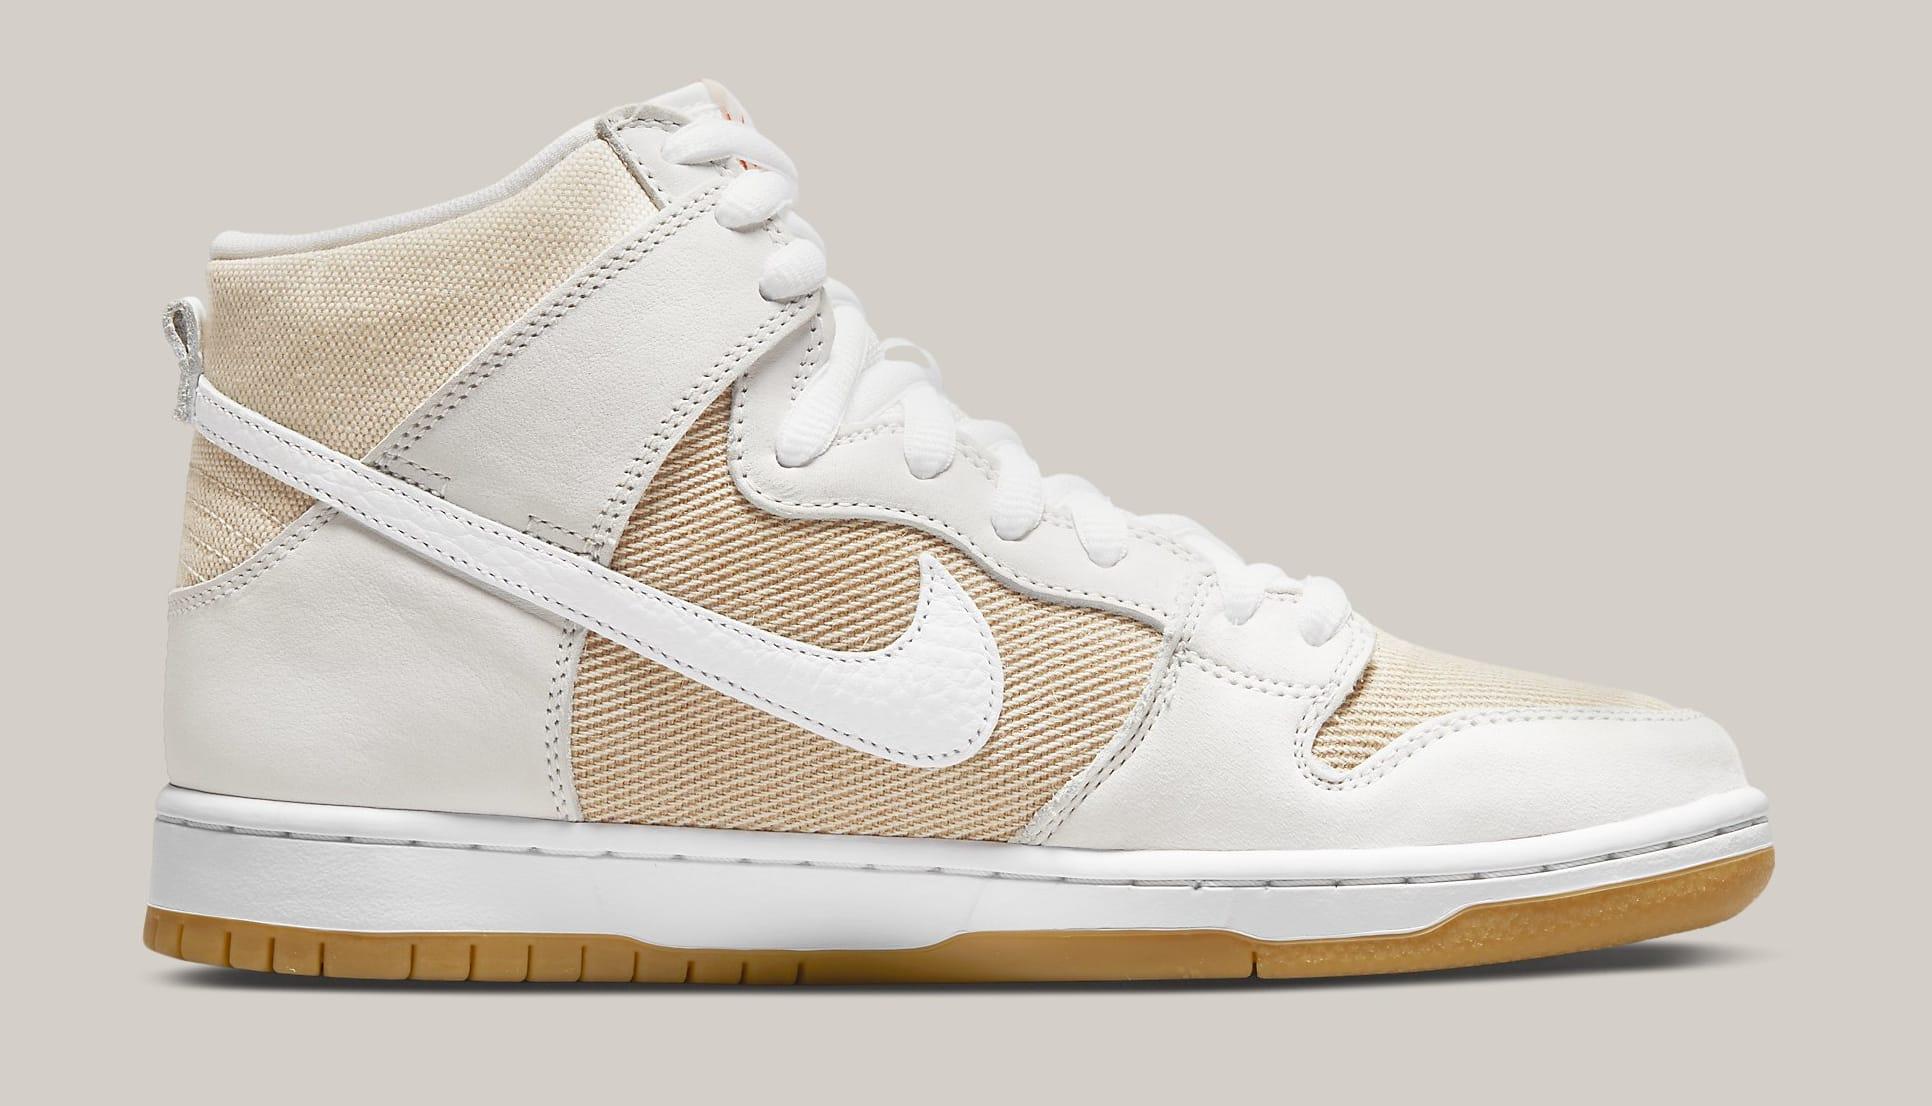 Nike SB Dunk High 'Unbleached' DA9626-100 Medial